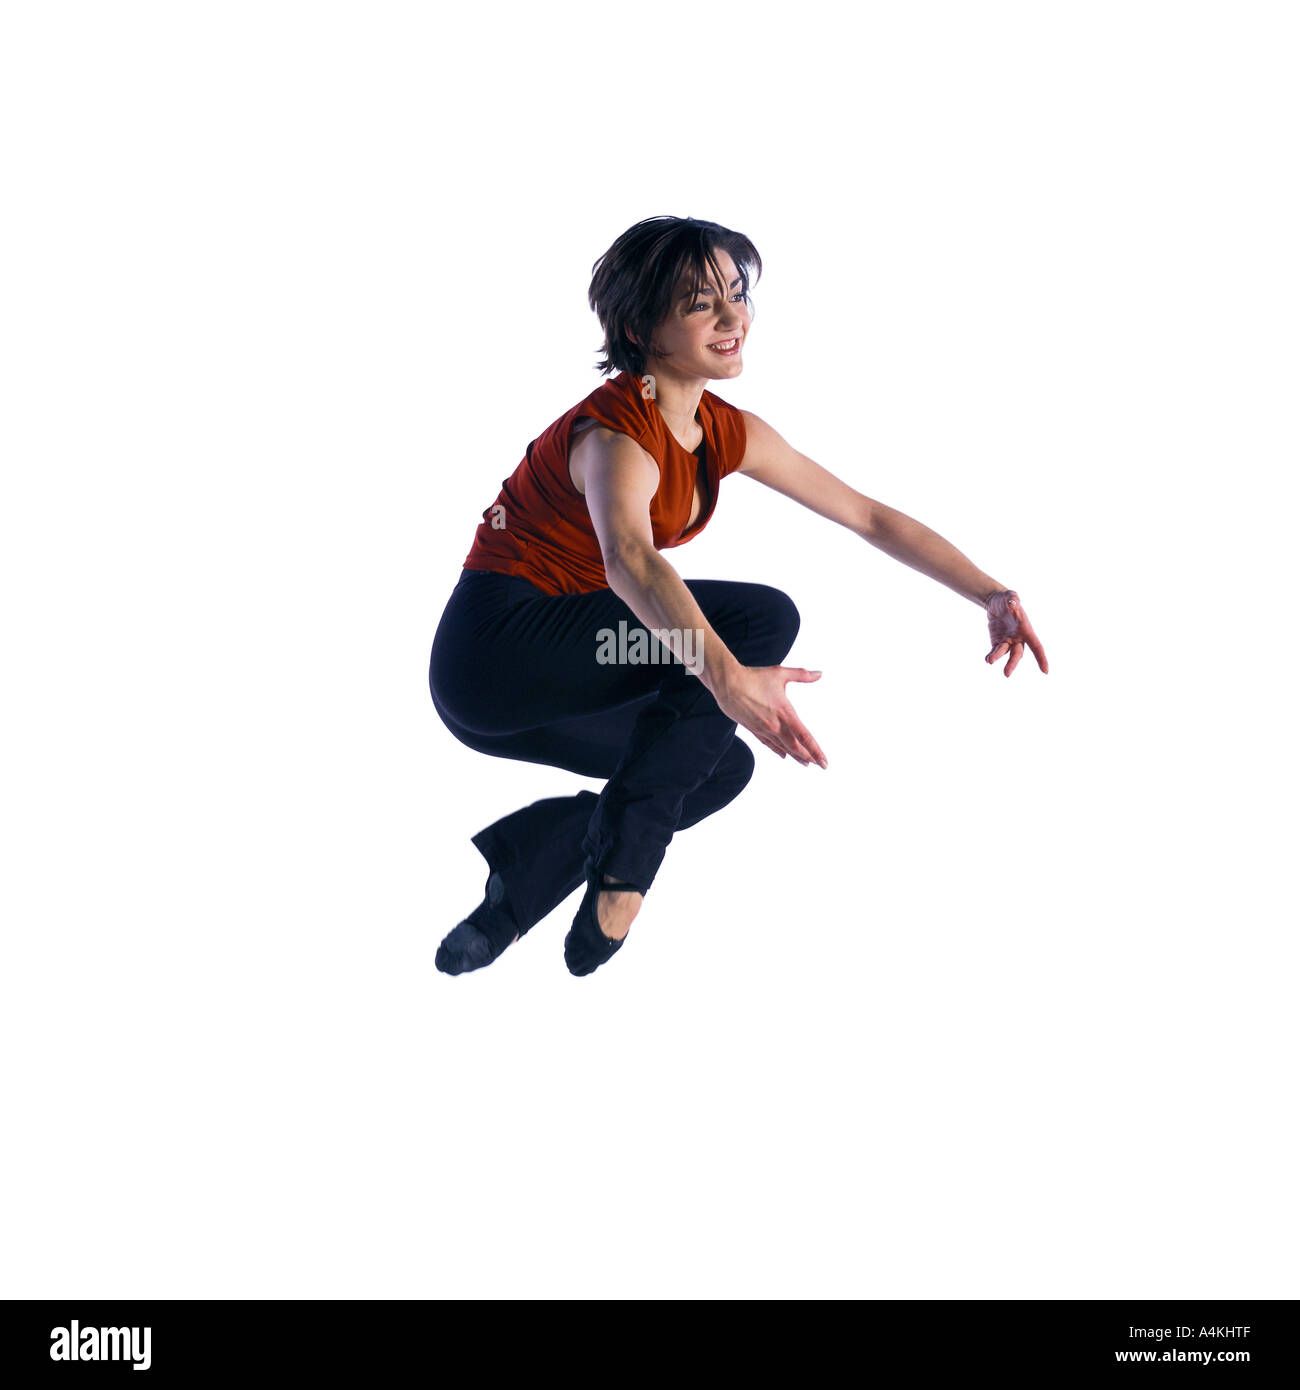 Woman jumping - Stock Image